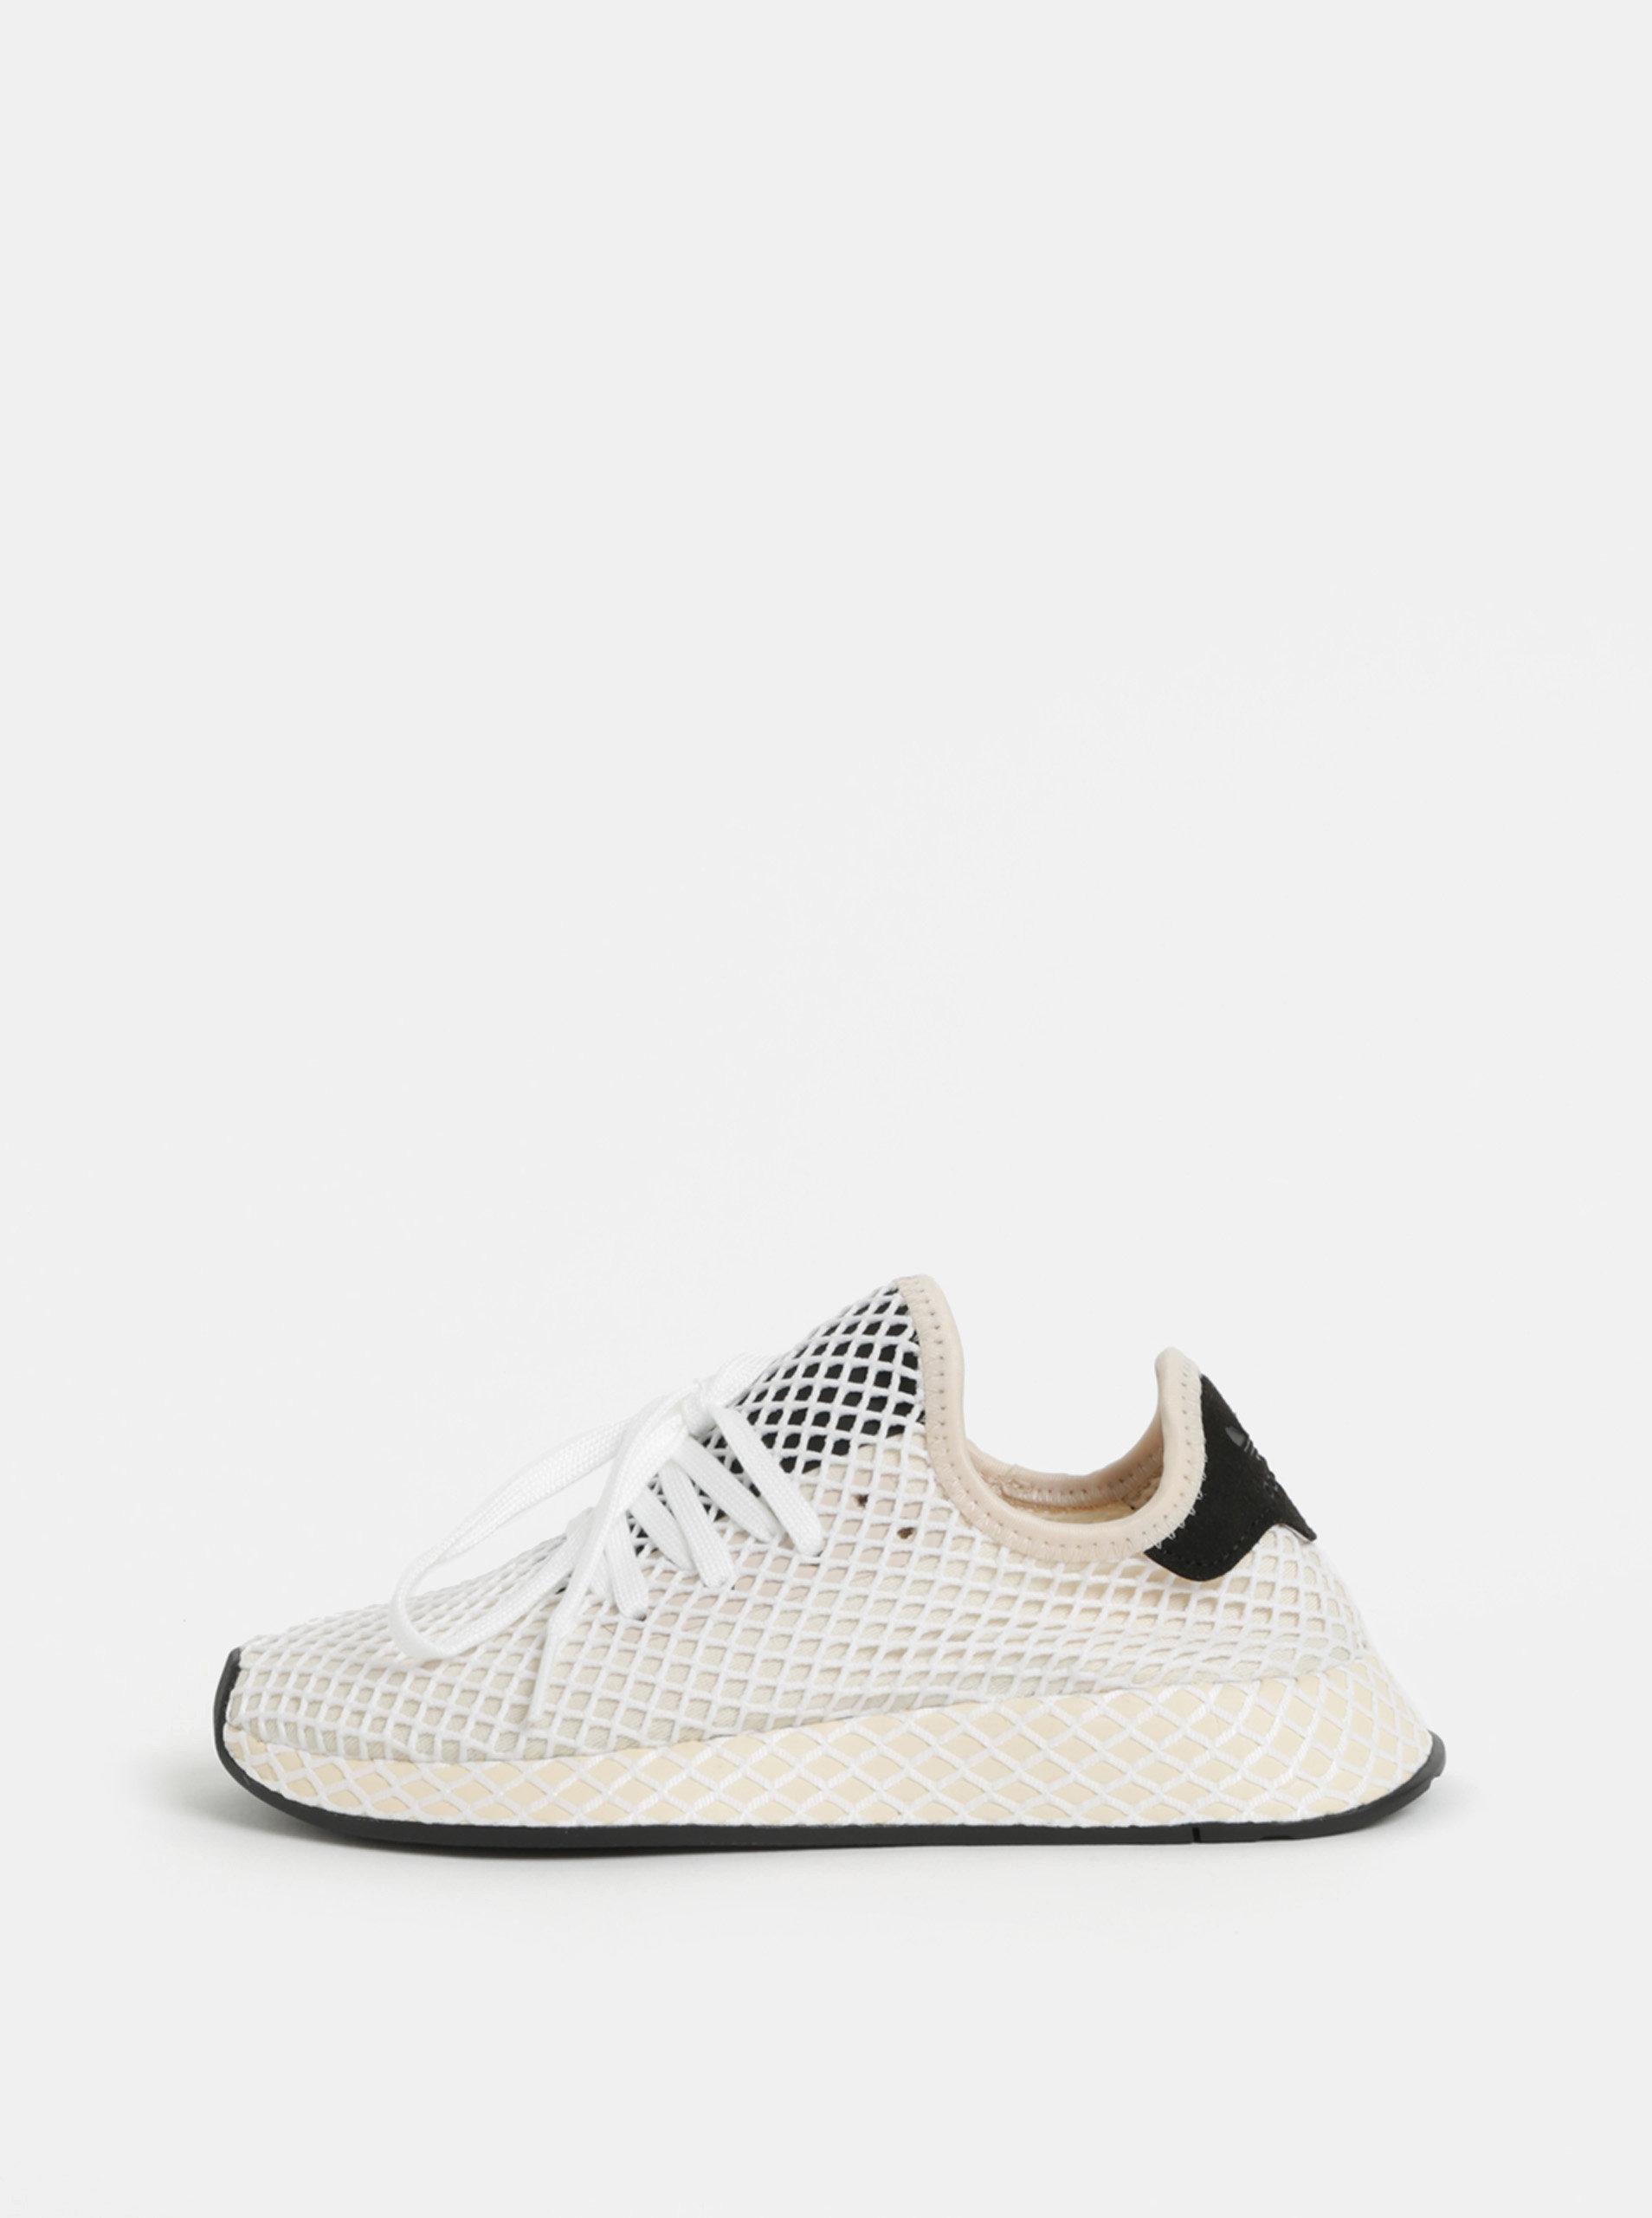 906eb93d535 Krémové dámské tenisky adidas Originals Deerupt Runner ...